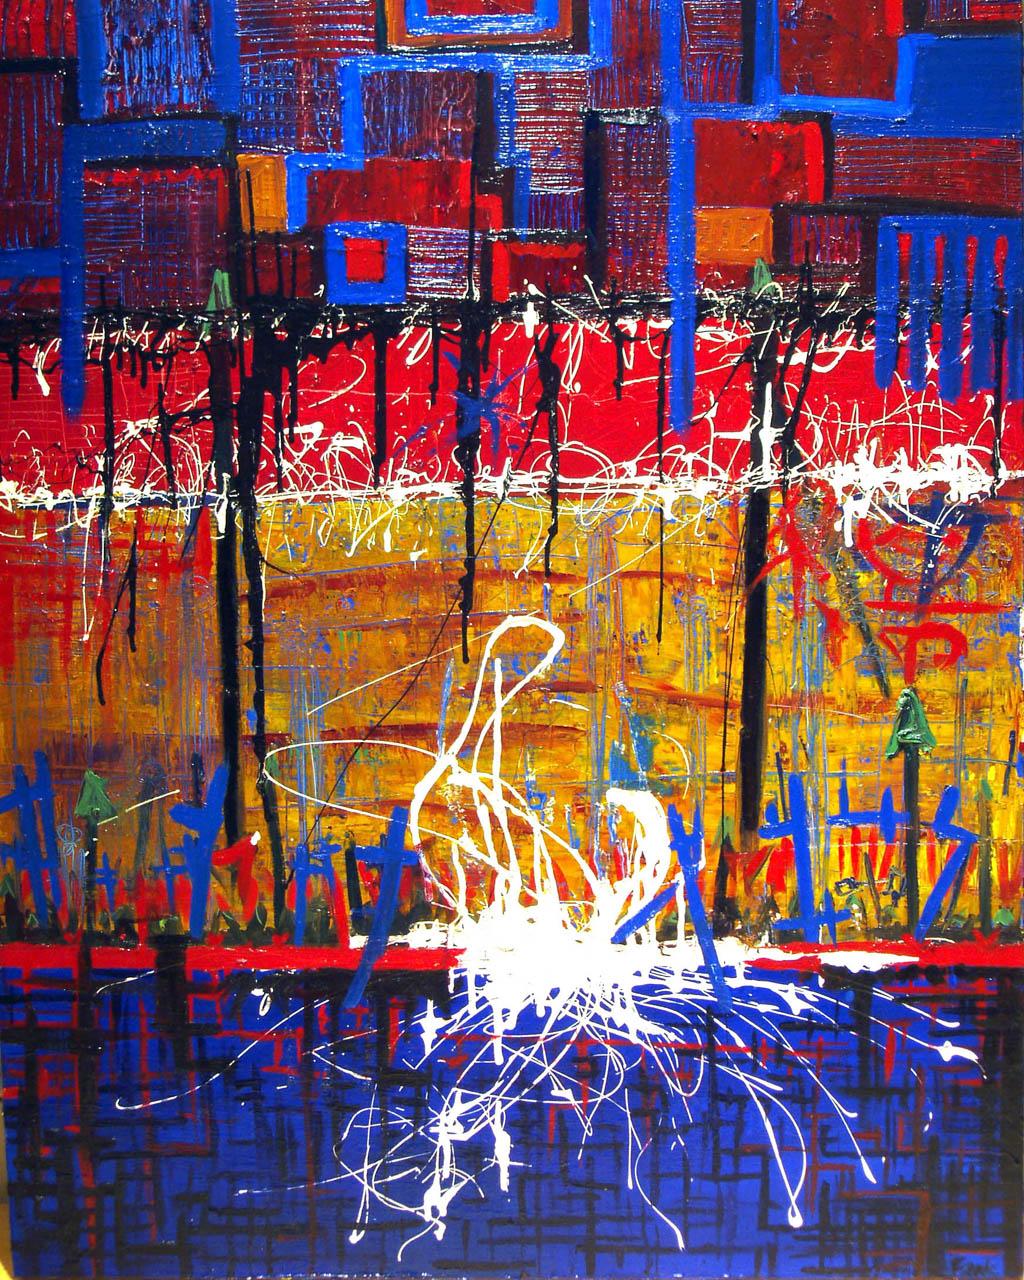 Romantic Proliferation, 2003,Oil on canvas, 36 x 48 inches